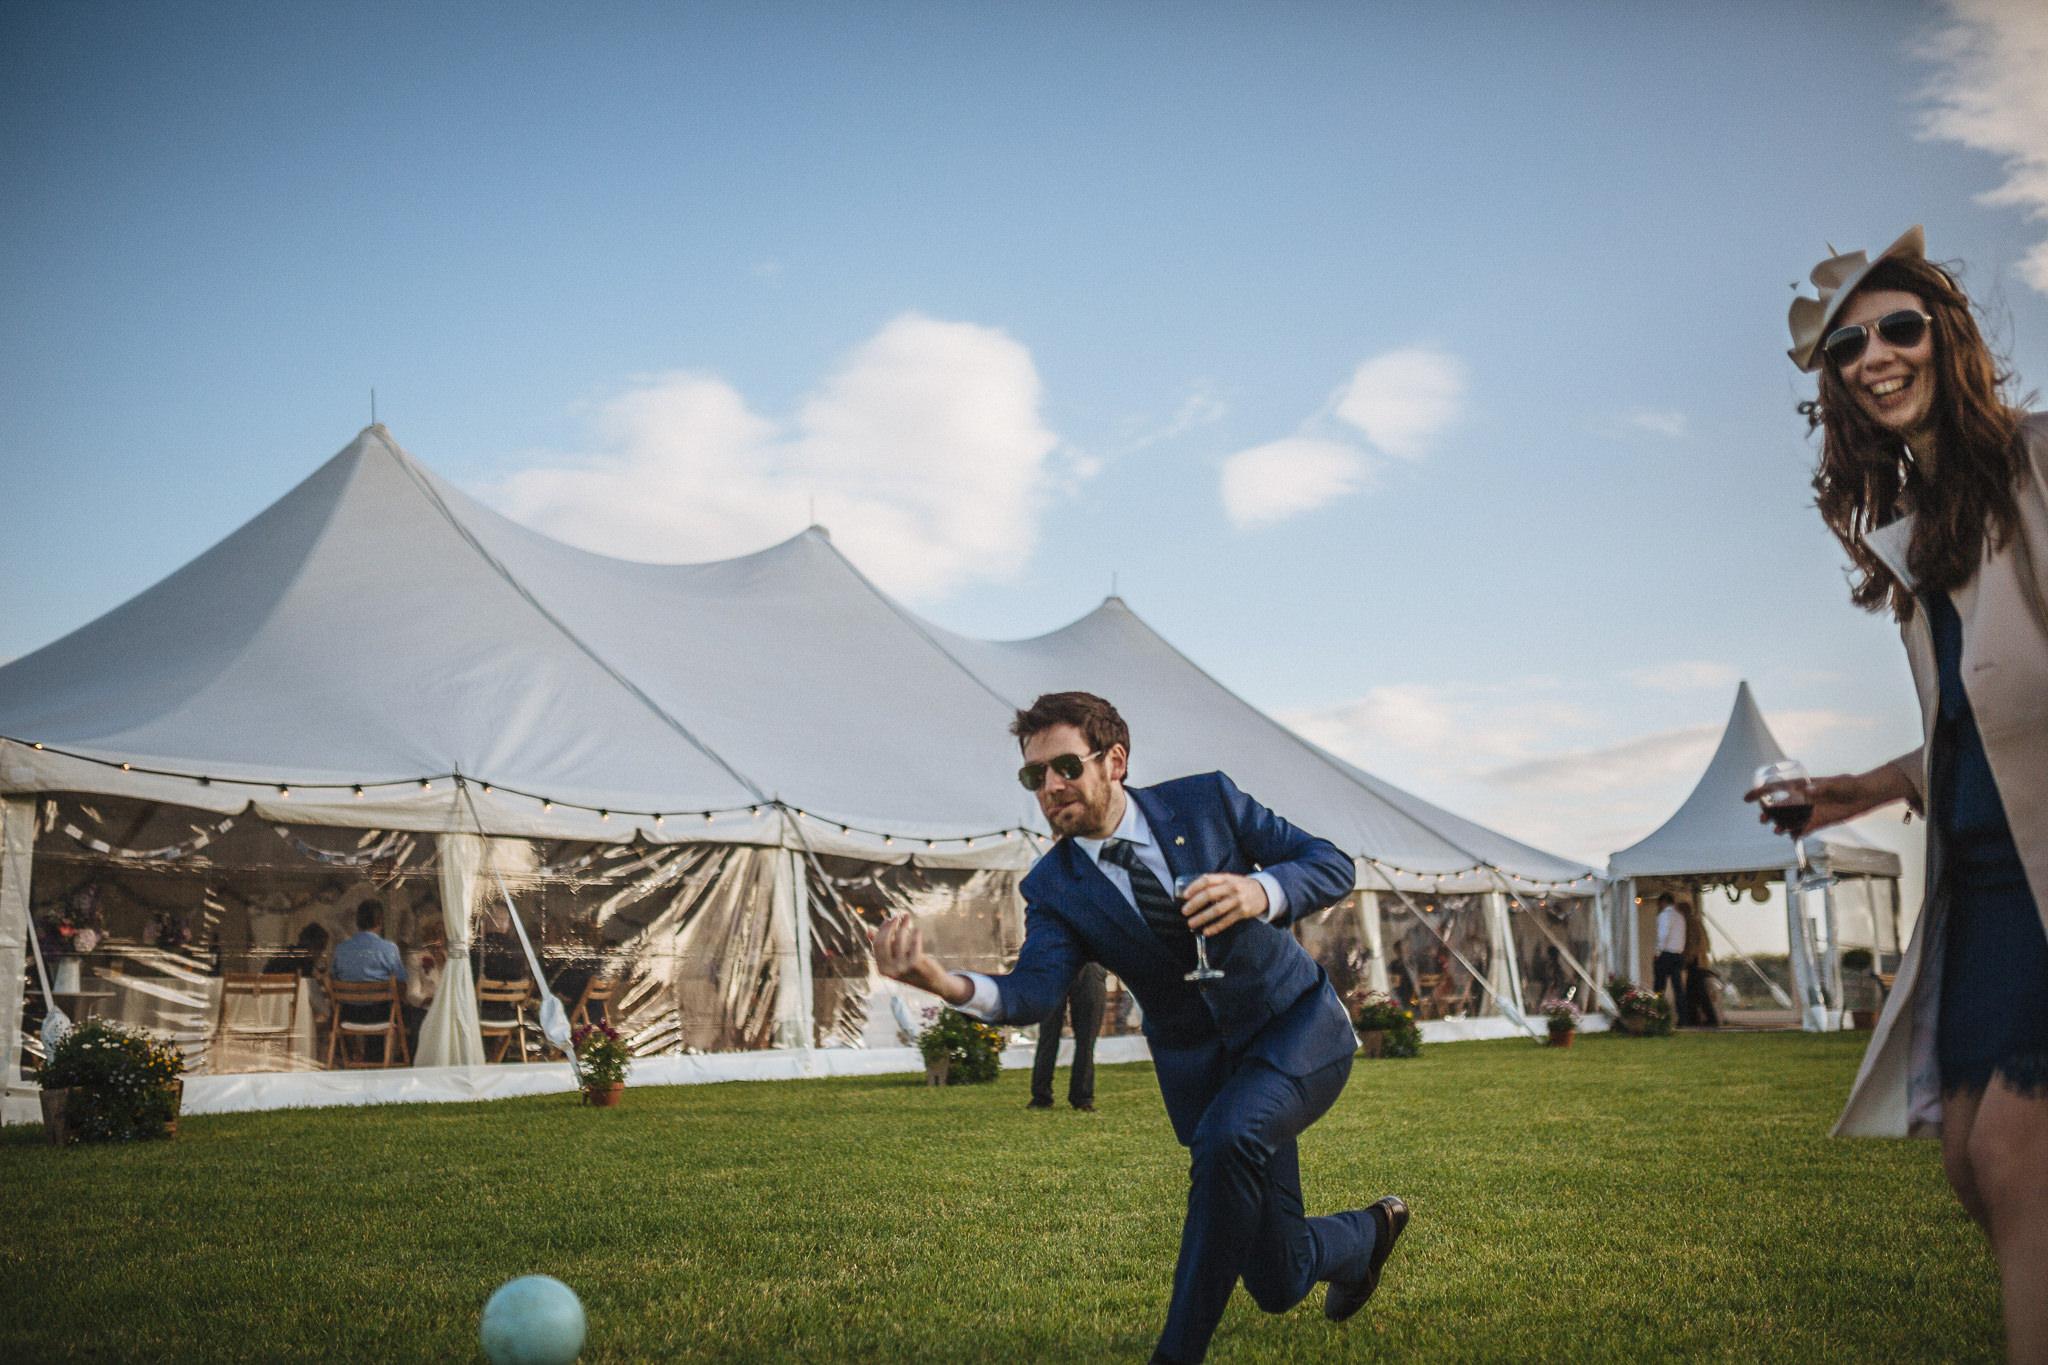 paul-marbrook-Farm-Wedding-Photographer-Lancashire-90078